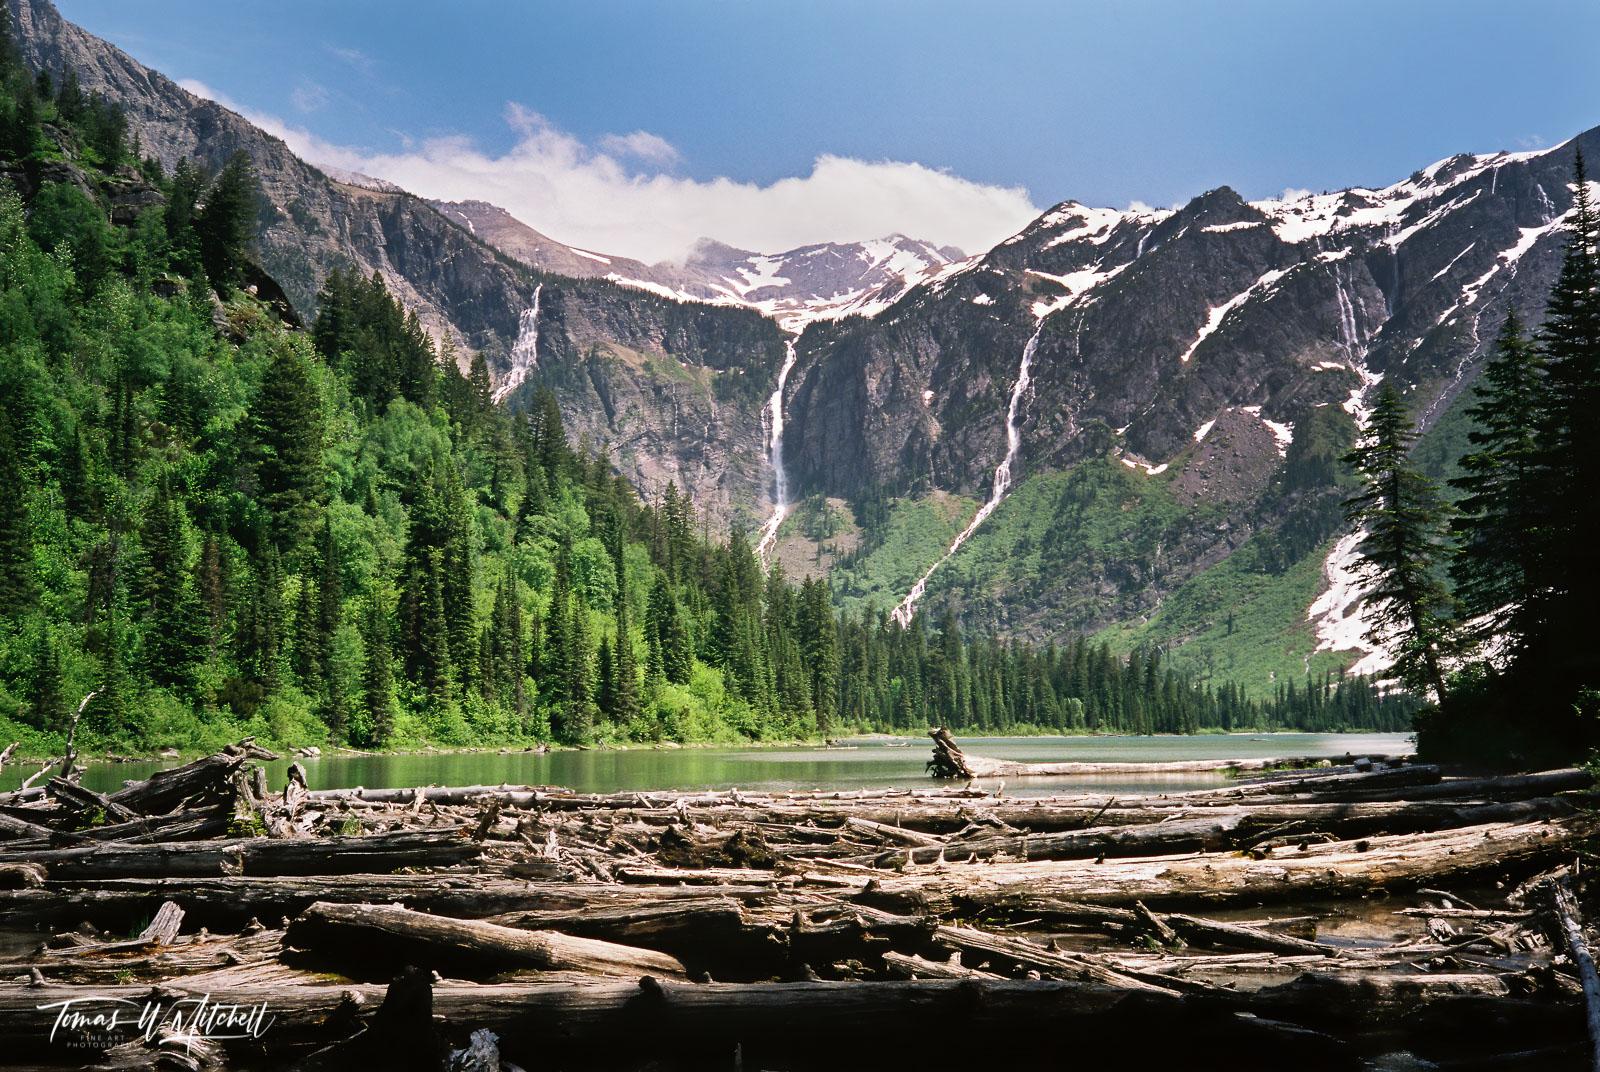 limited edition, fine art, prints, photograph, film, avalanche lake, glacier national park, montana, log jam, waterfall, peaks, blue sky, clouds, summer, mountain, , photo